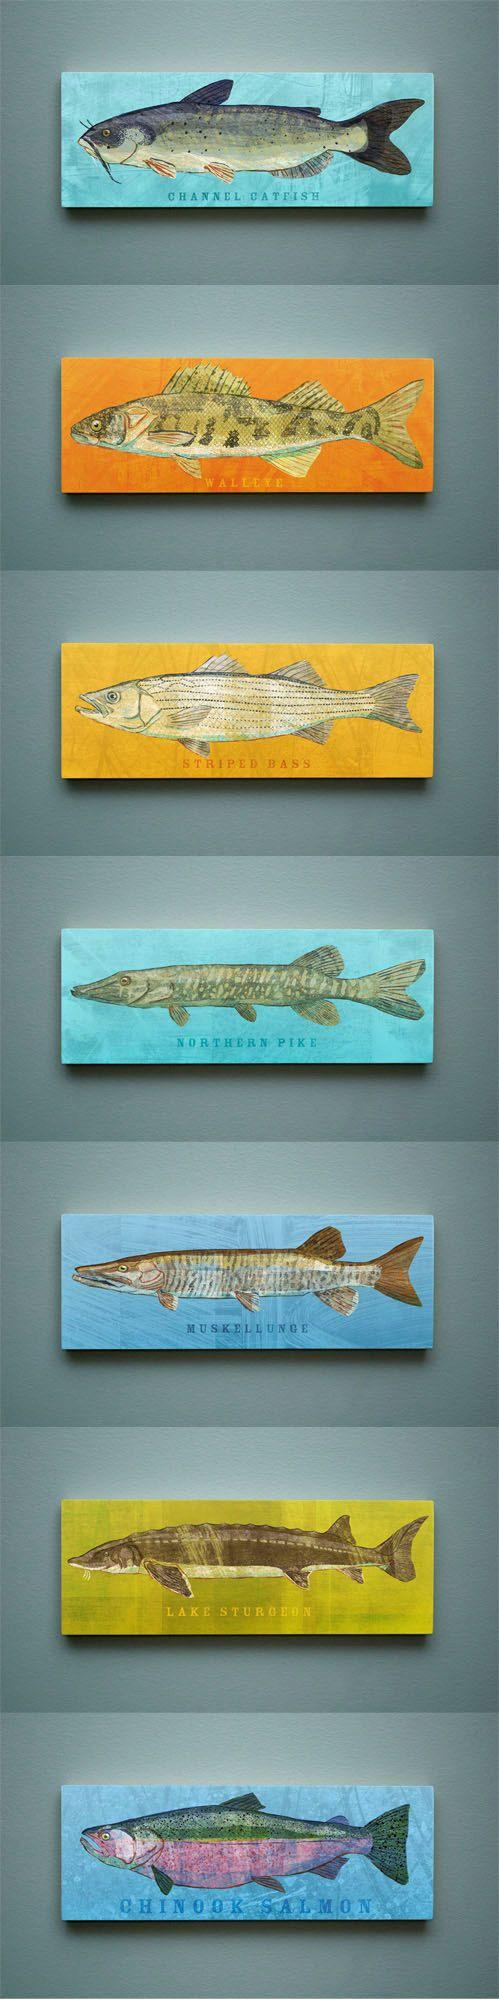 Freshwater fish art - Freshwater Fish Art Series Large Art Block Pick The Print 4 In X 11